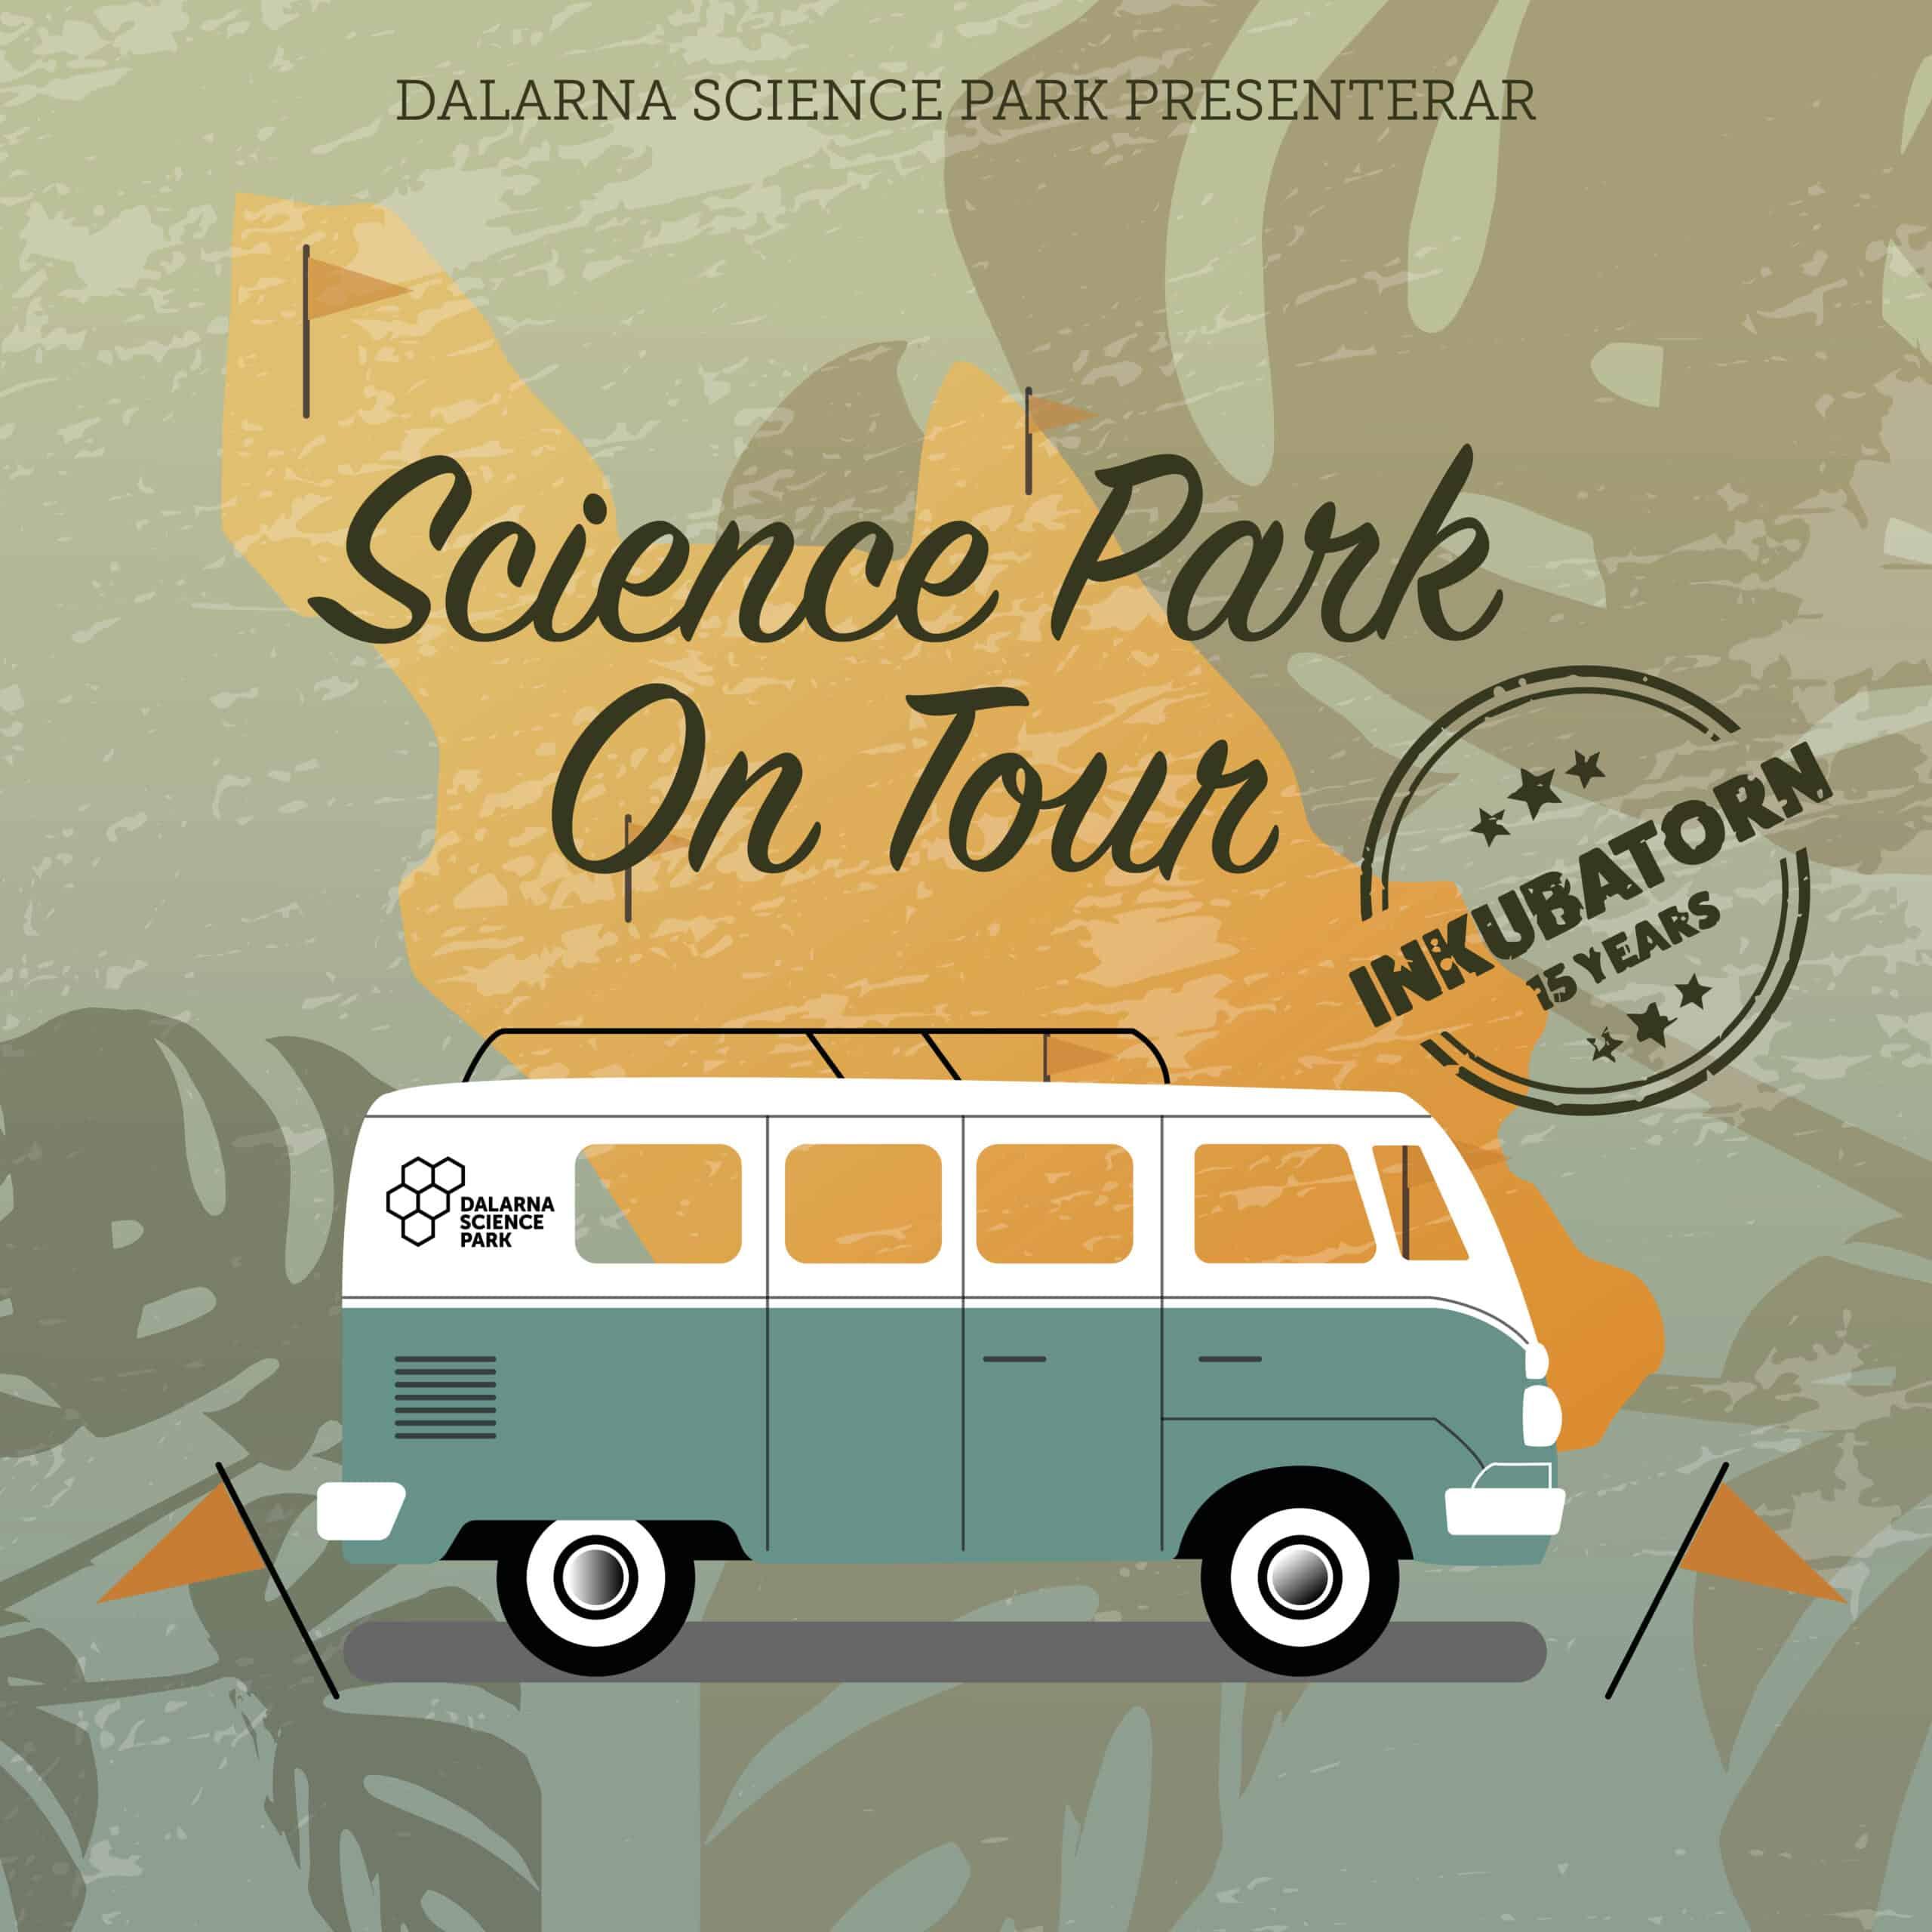 Dalarna Science Park on Tour